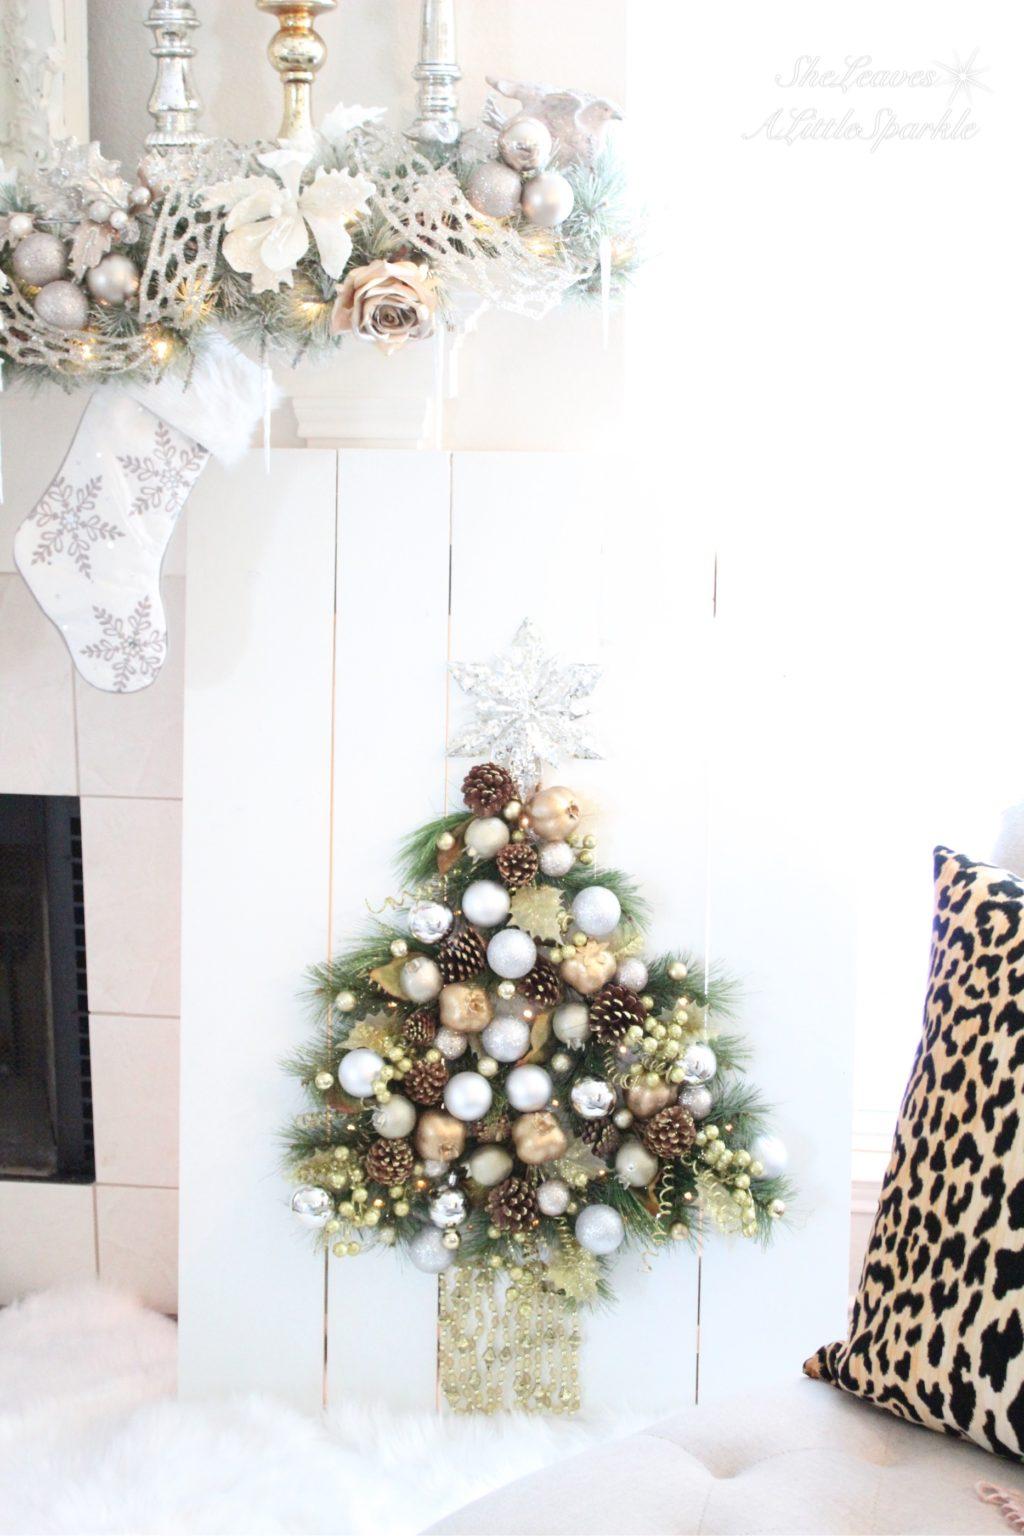 Home Depot DIH Workshop Holiday Ornament Display - Summer Adams